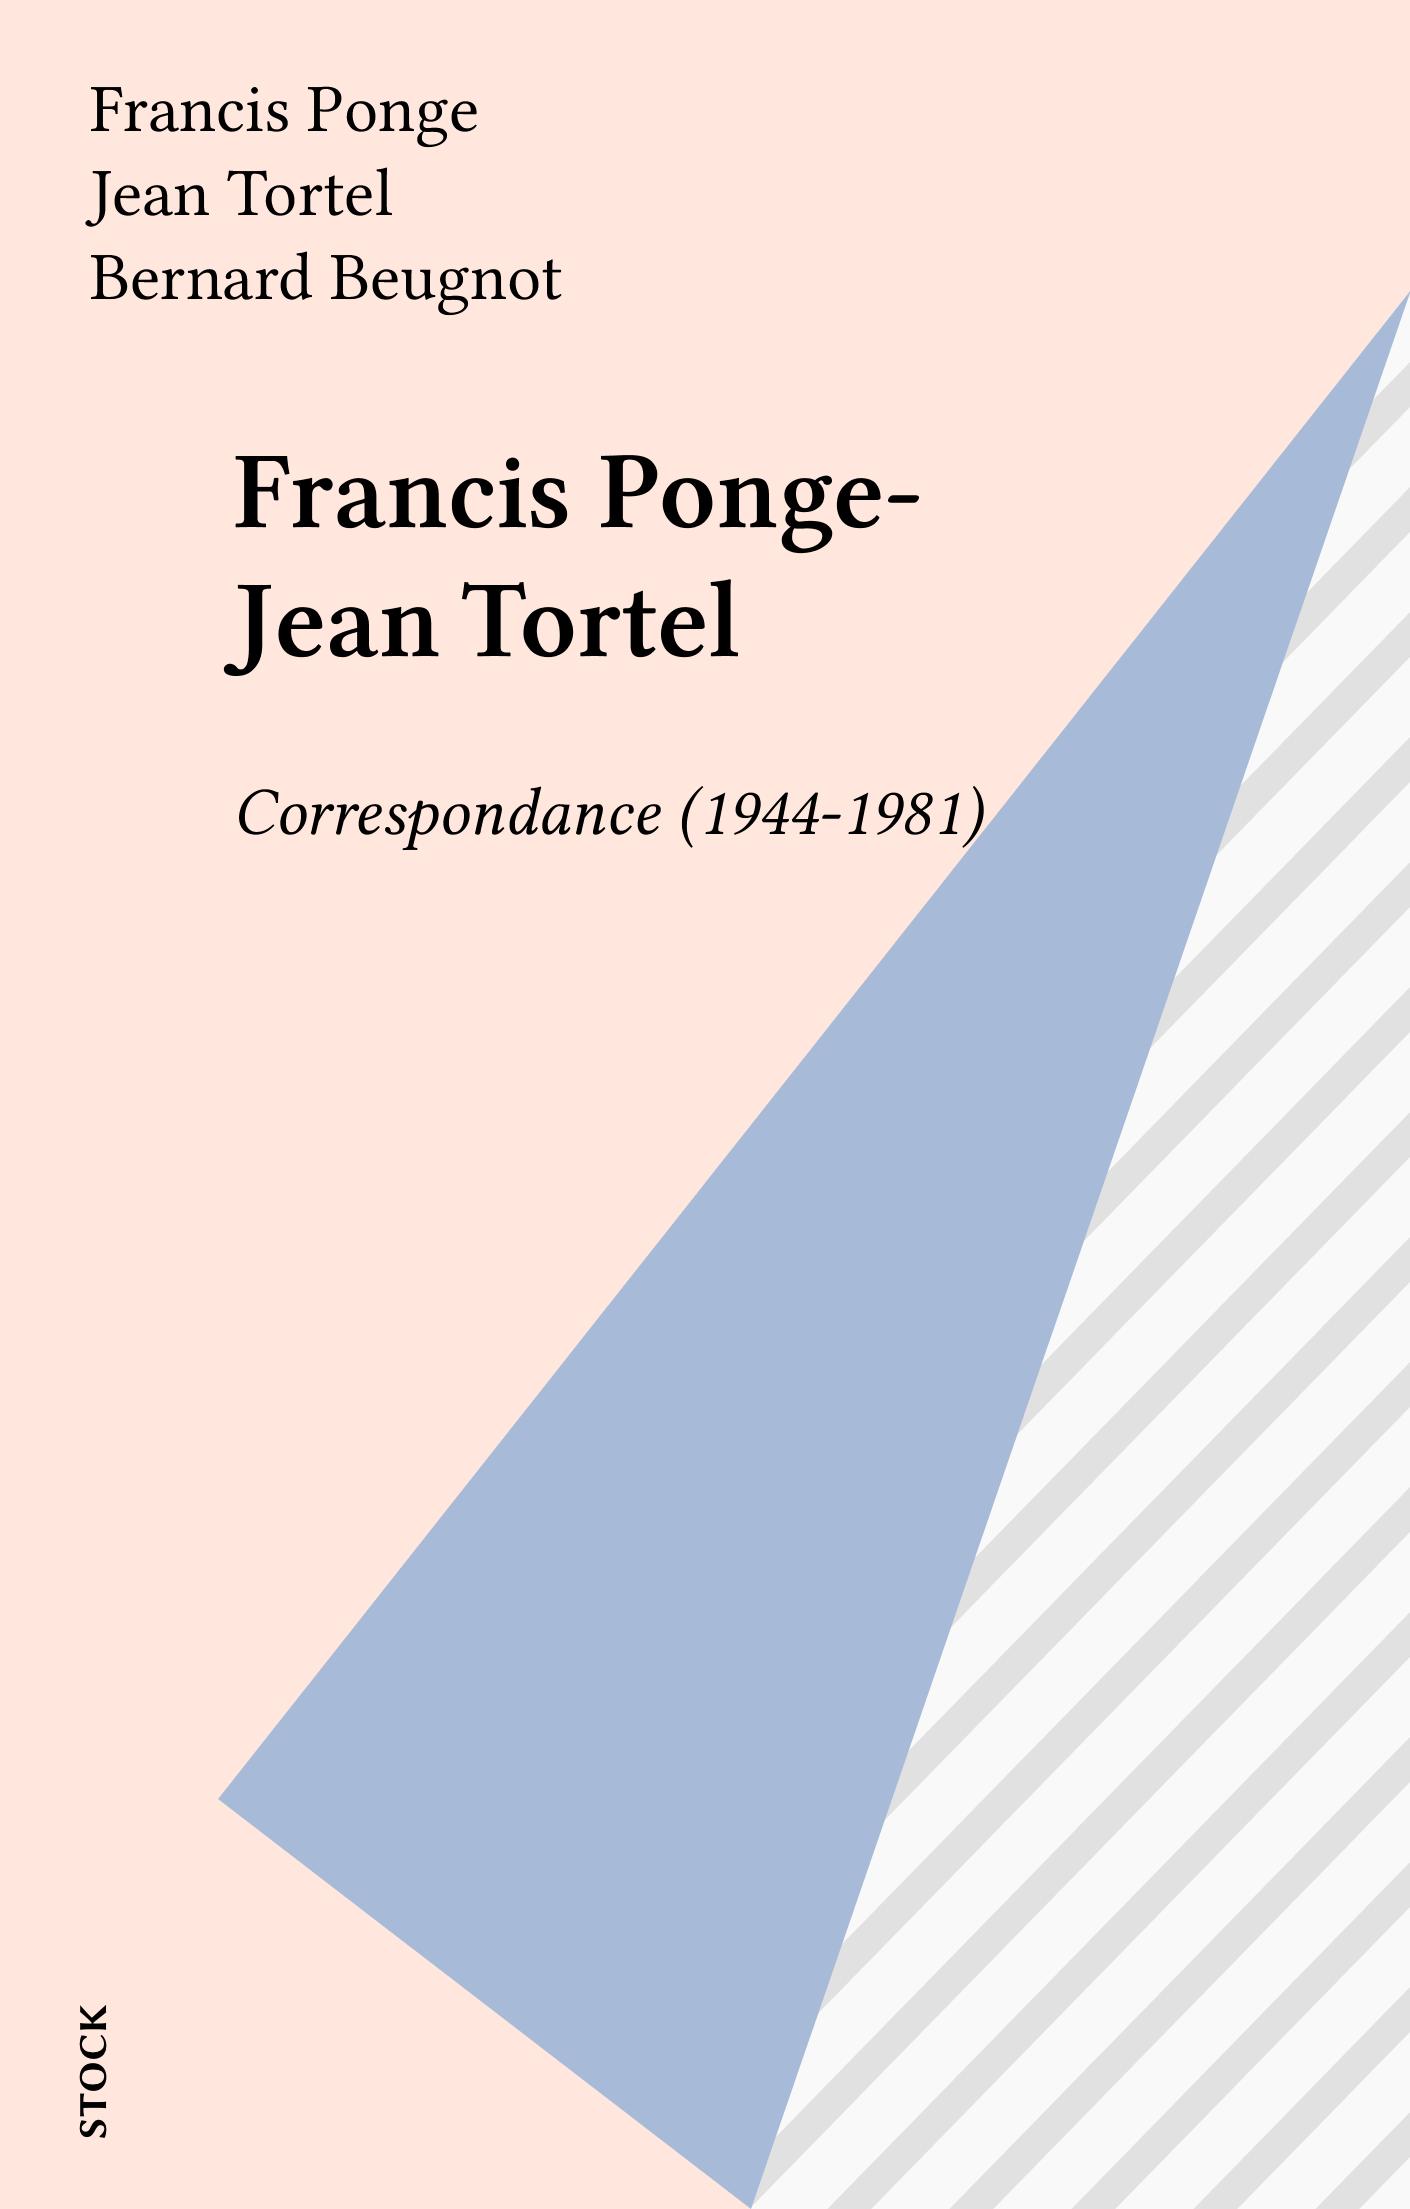 Francis Ponge-Jean Tortel, CORRESPONDANCE (1944-1981)